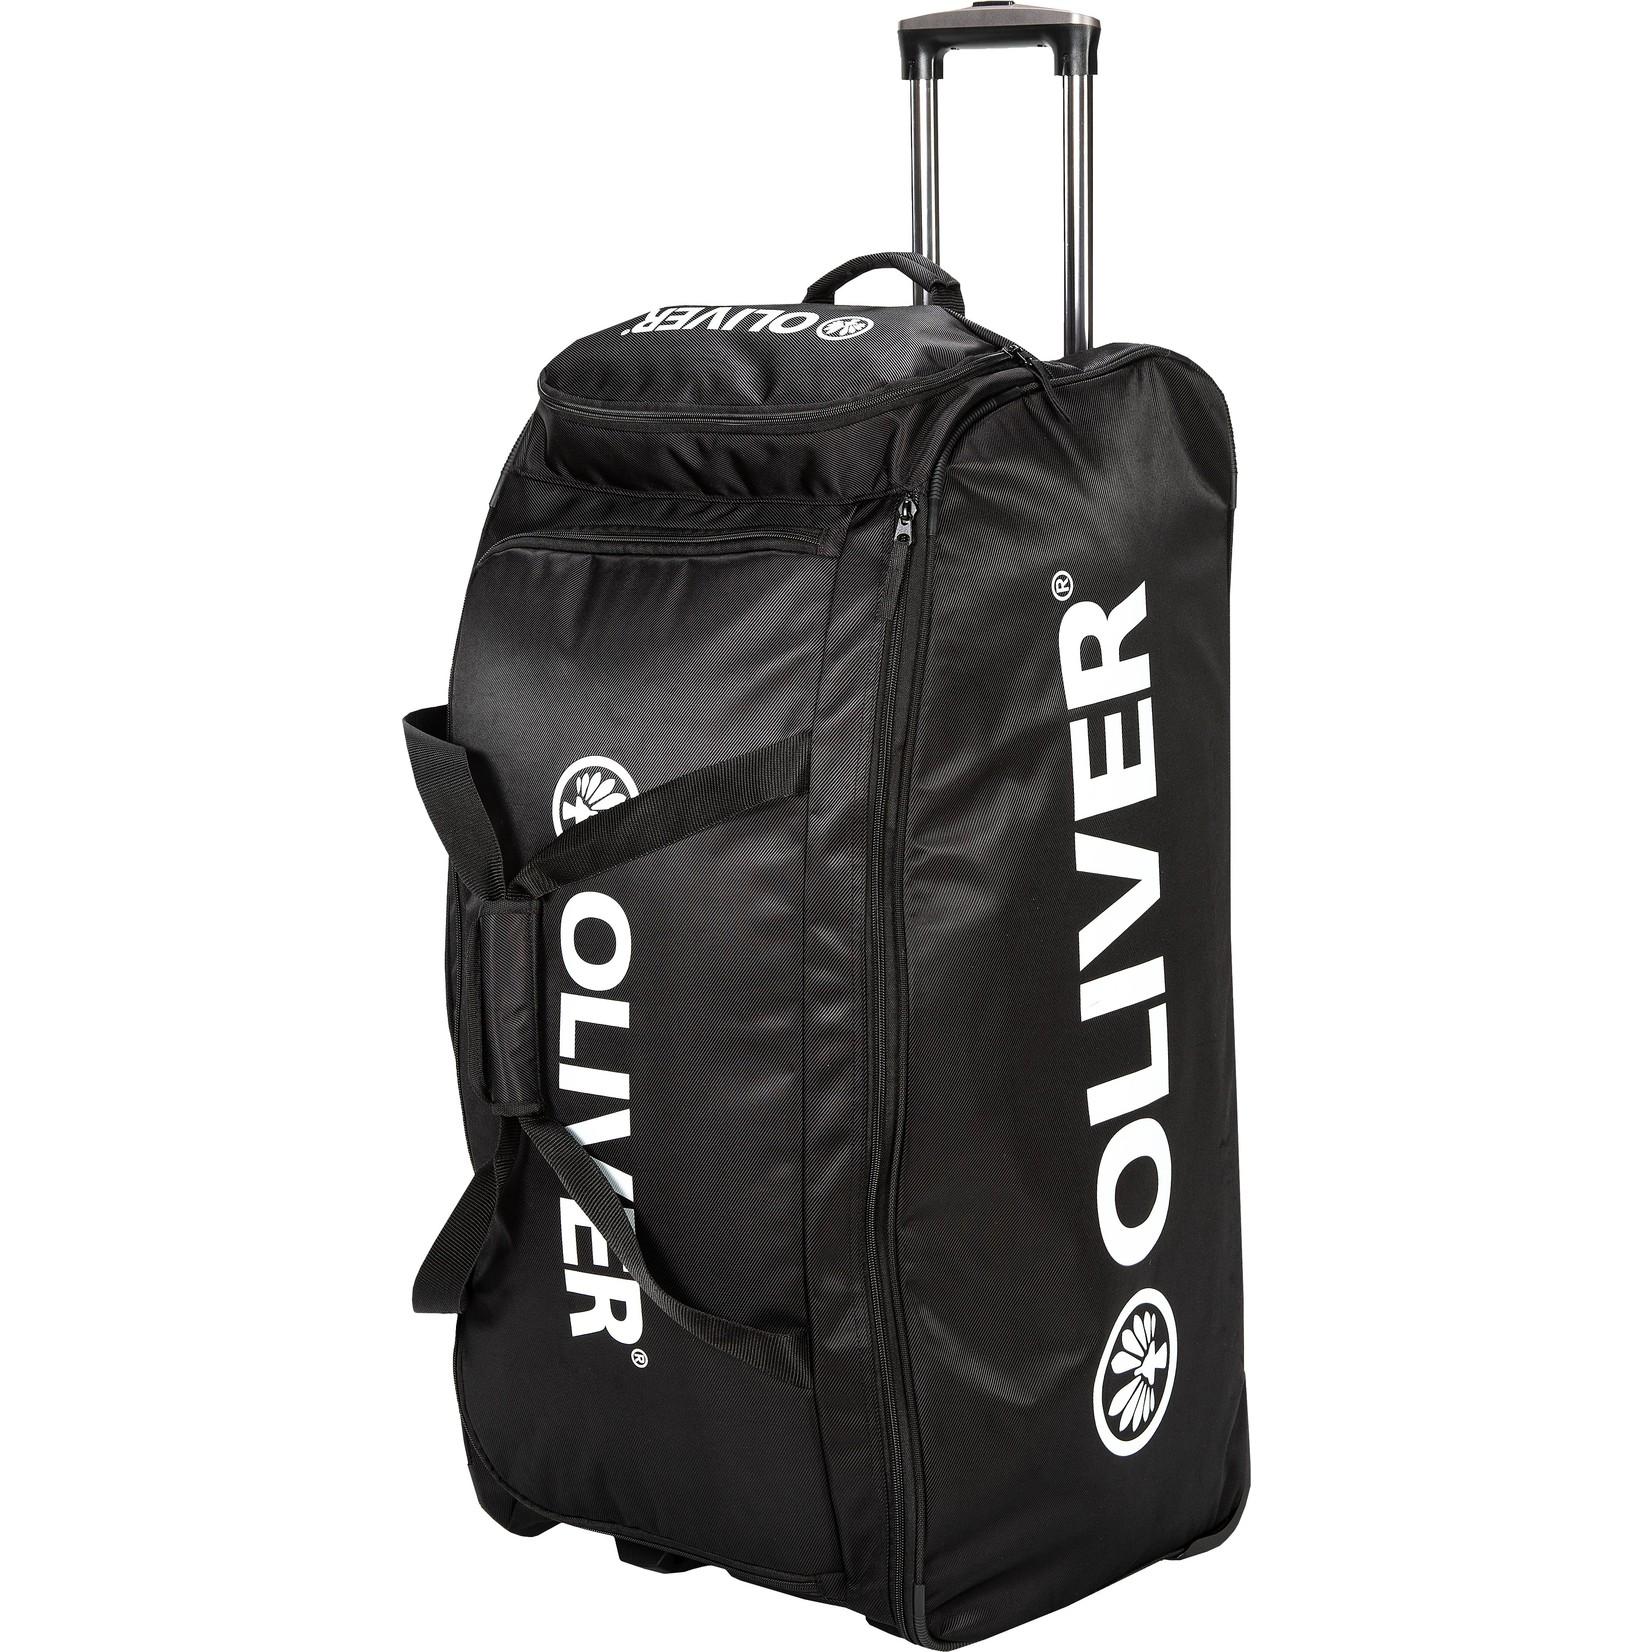 Oliver Travelbag X-large